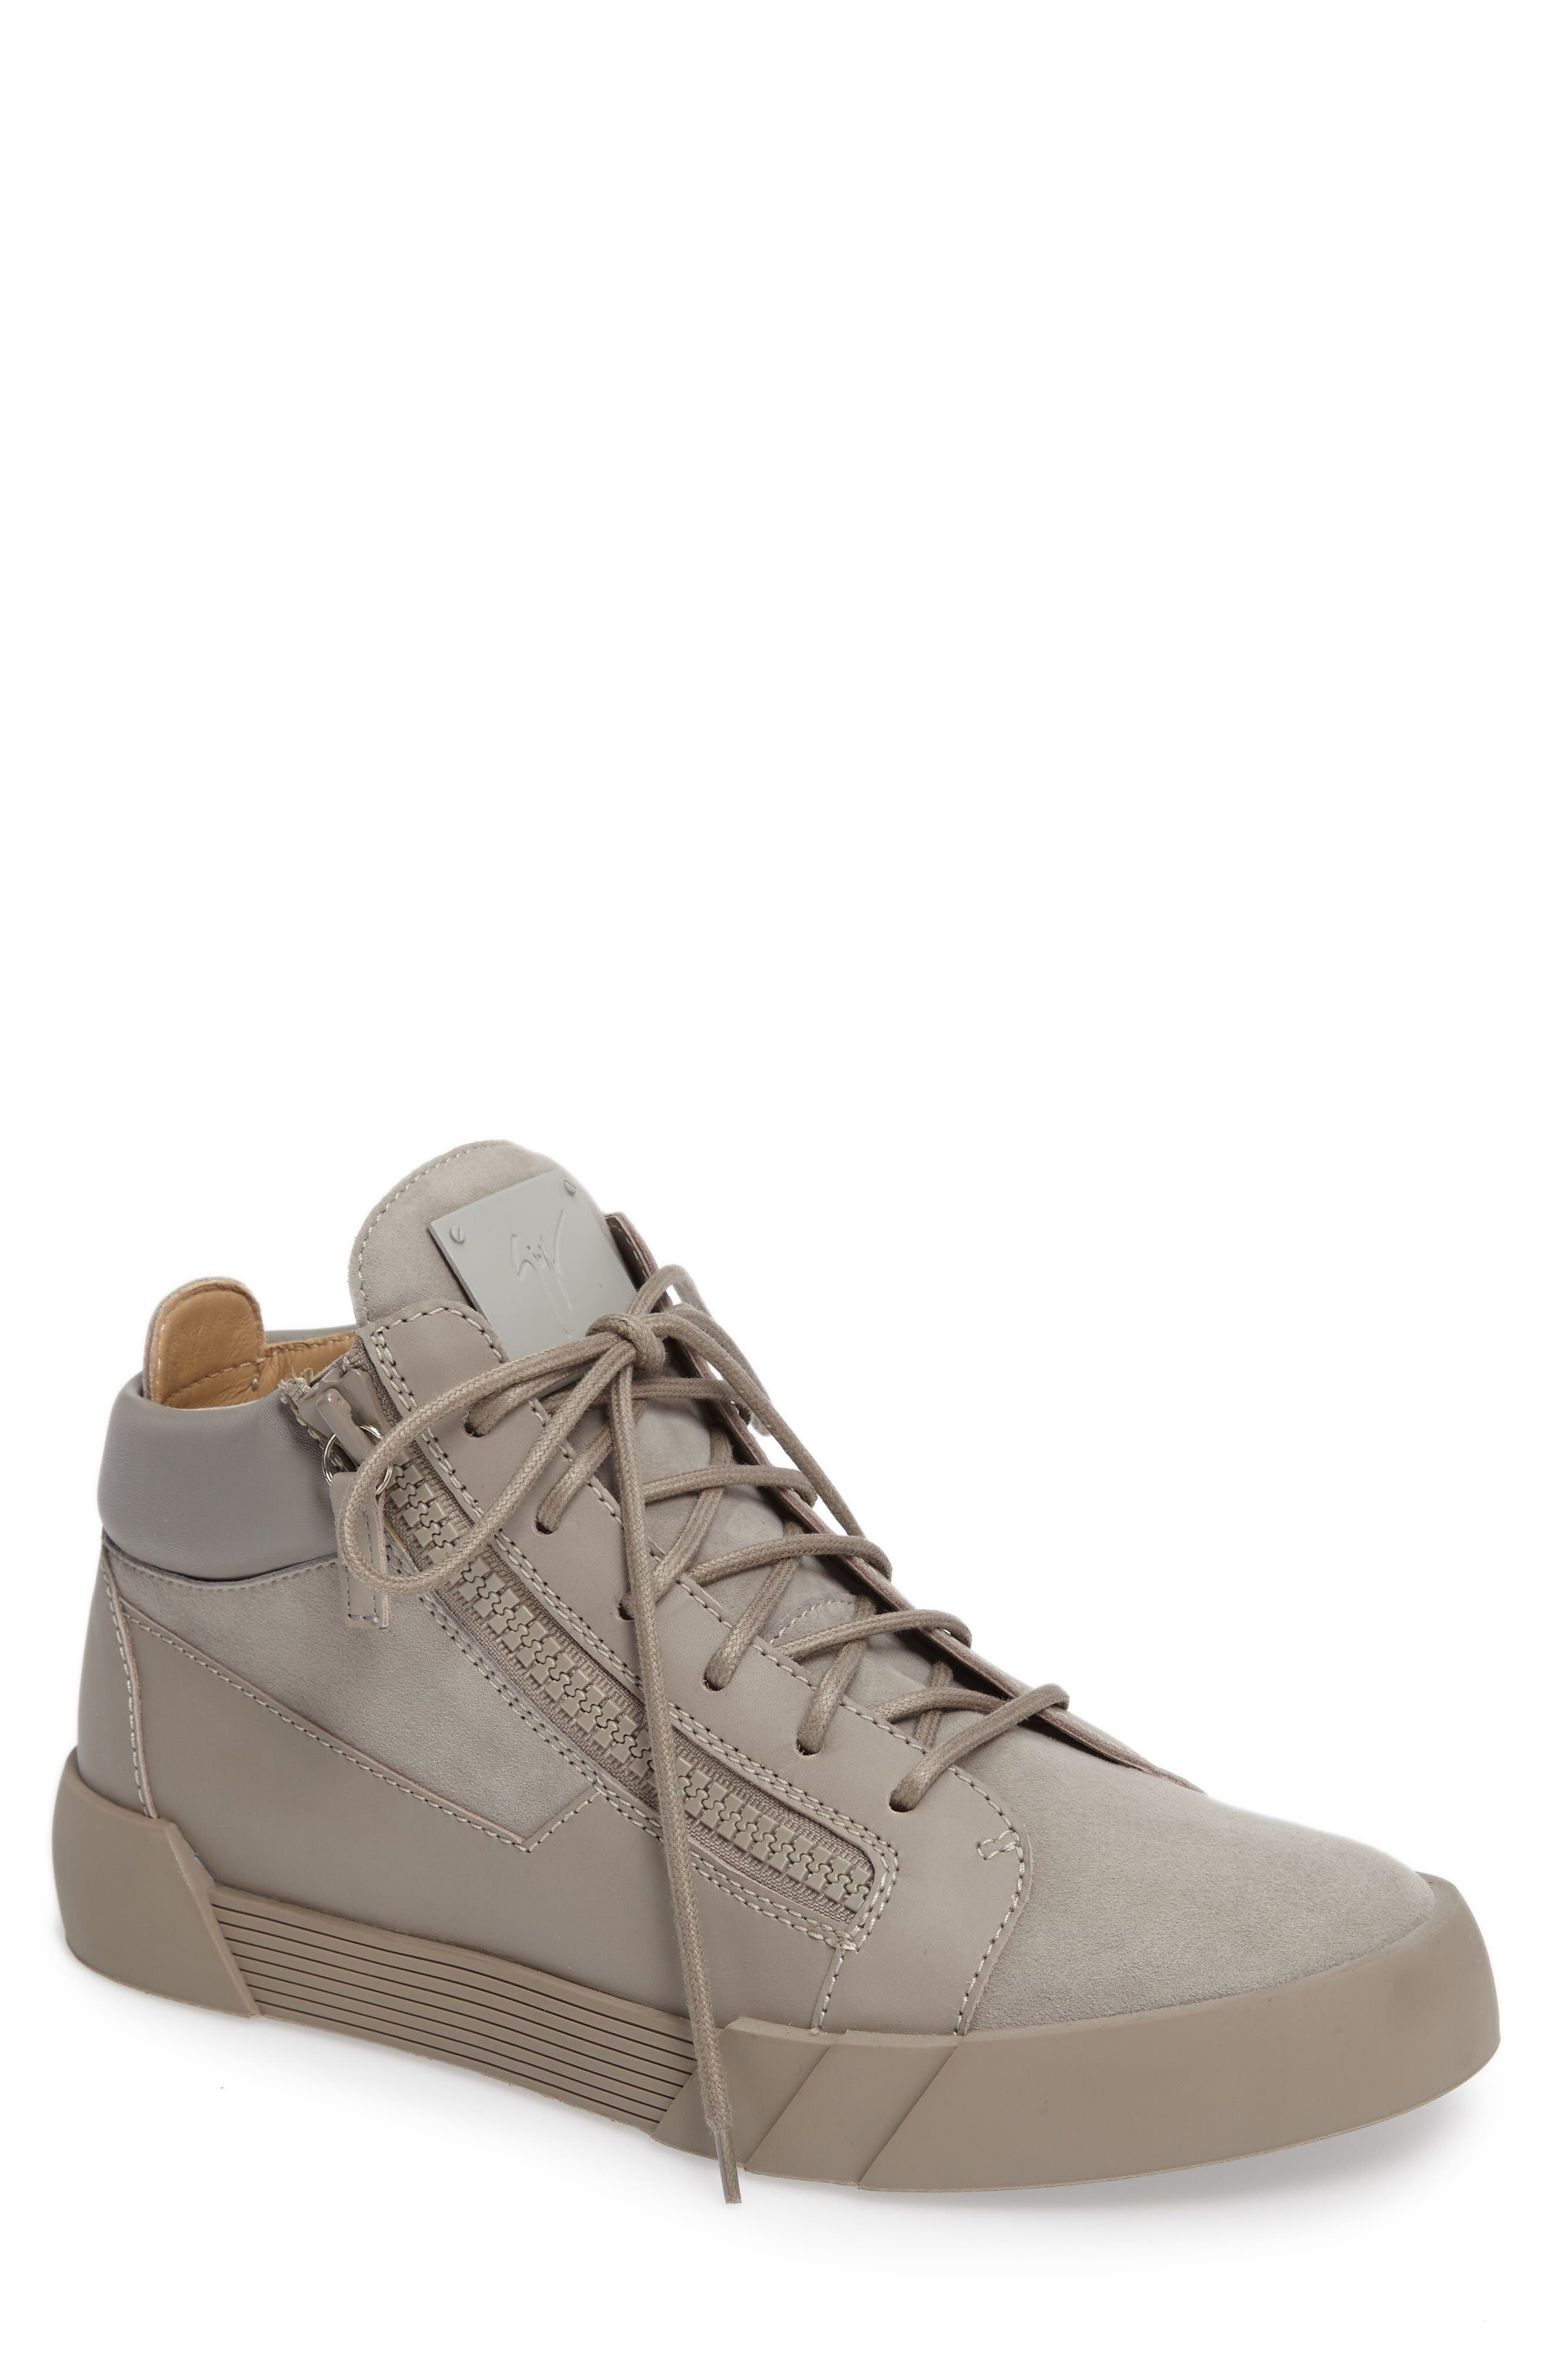 GIUSEPPE ZANOTTI Mid Sneaker